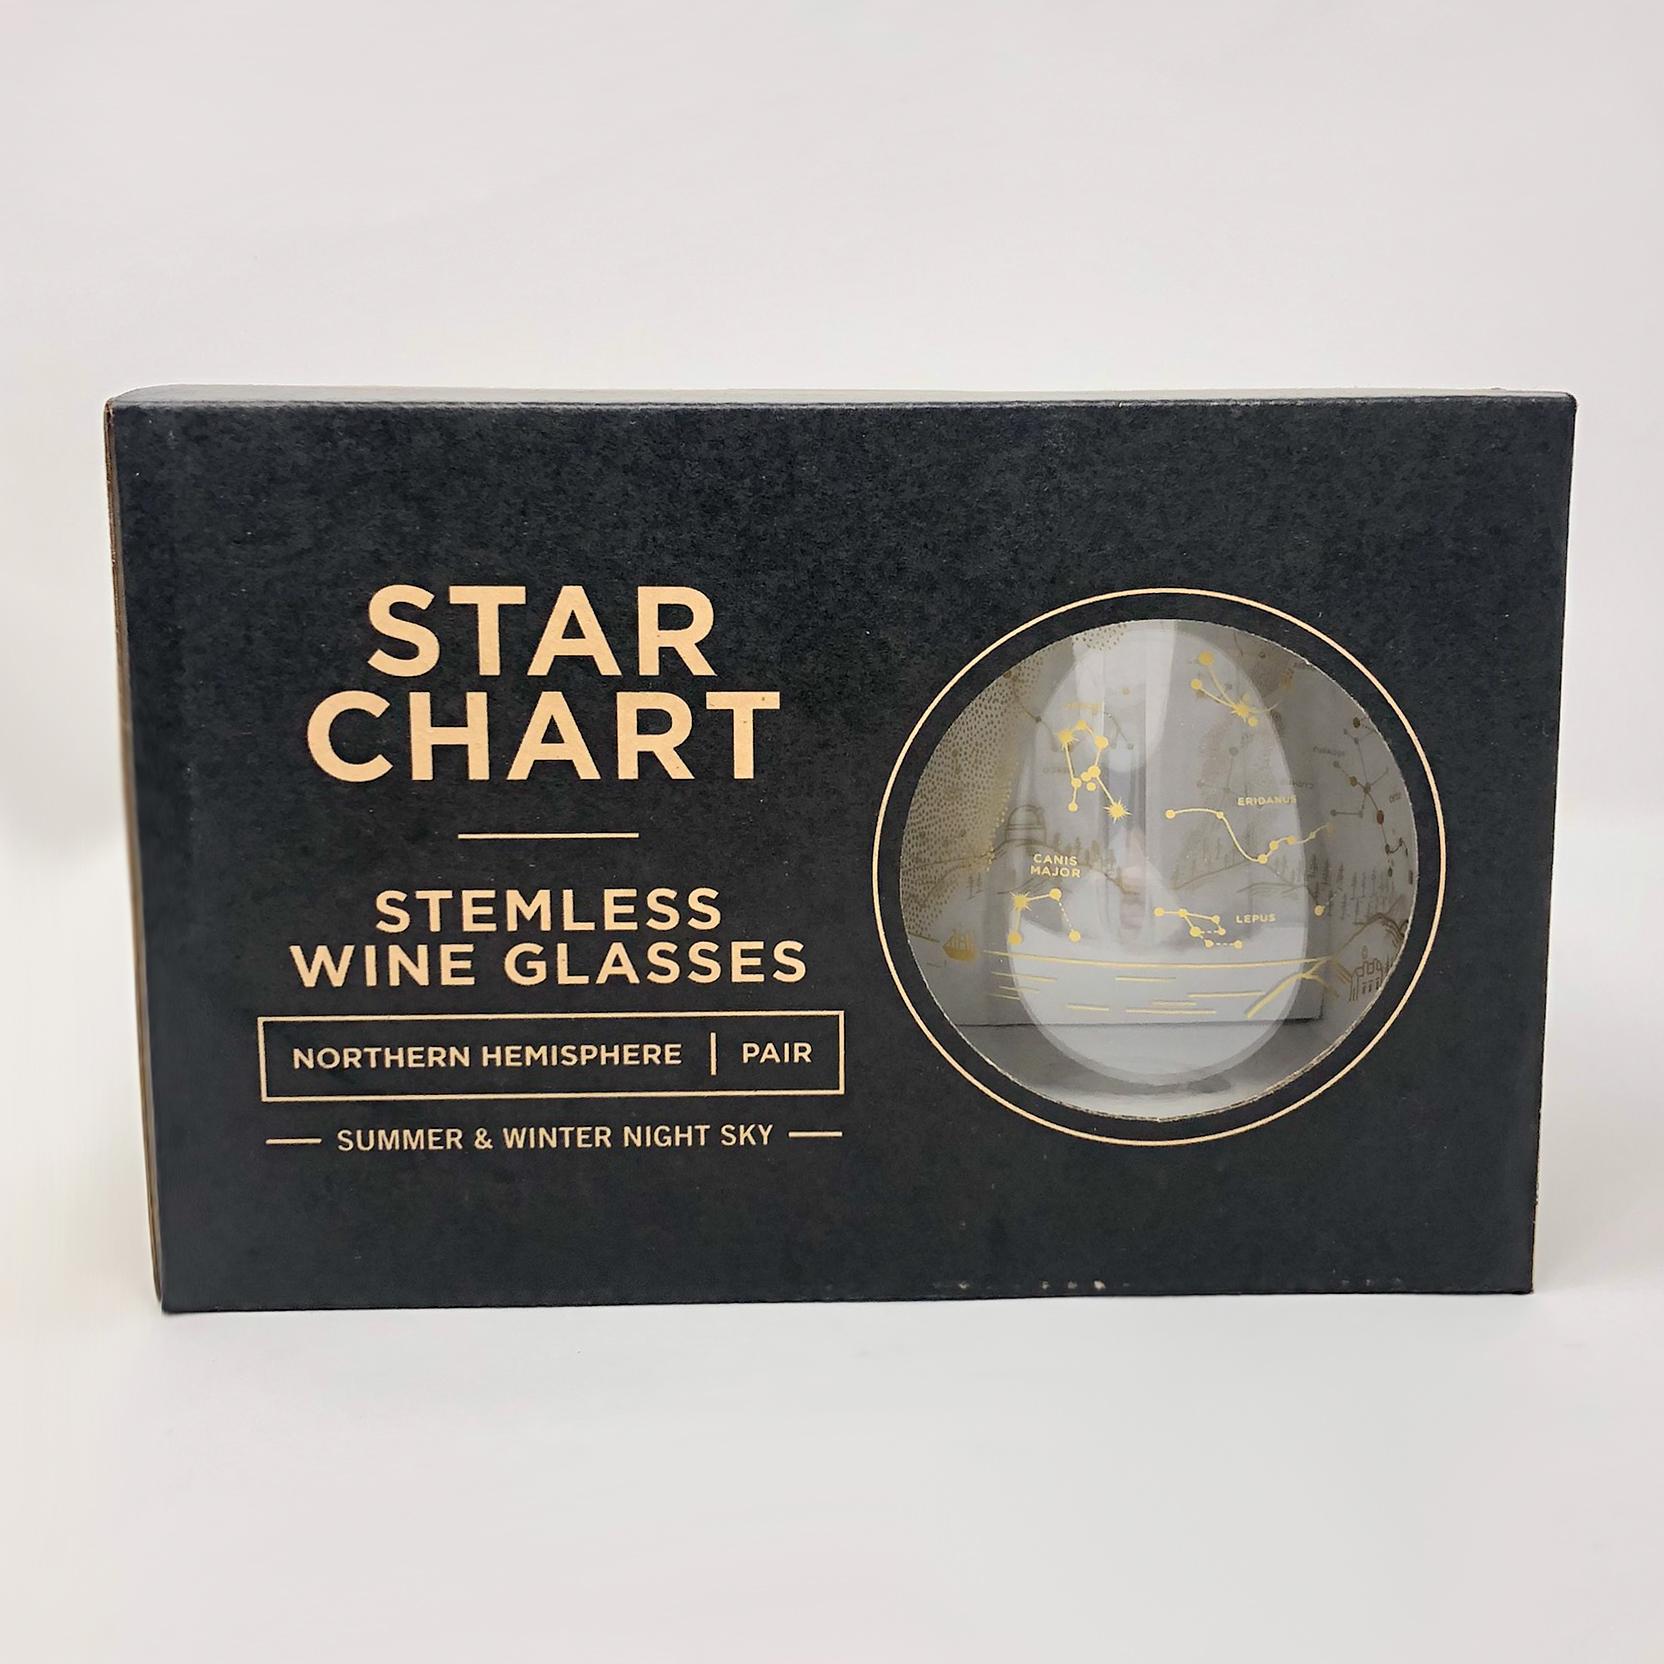 Star chart stemless wineglass set